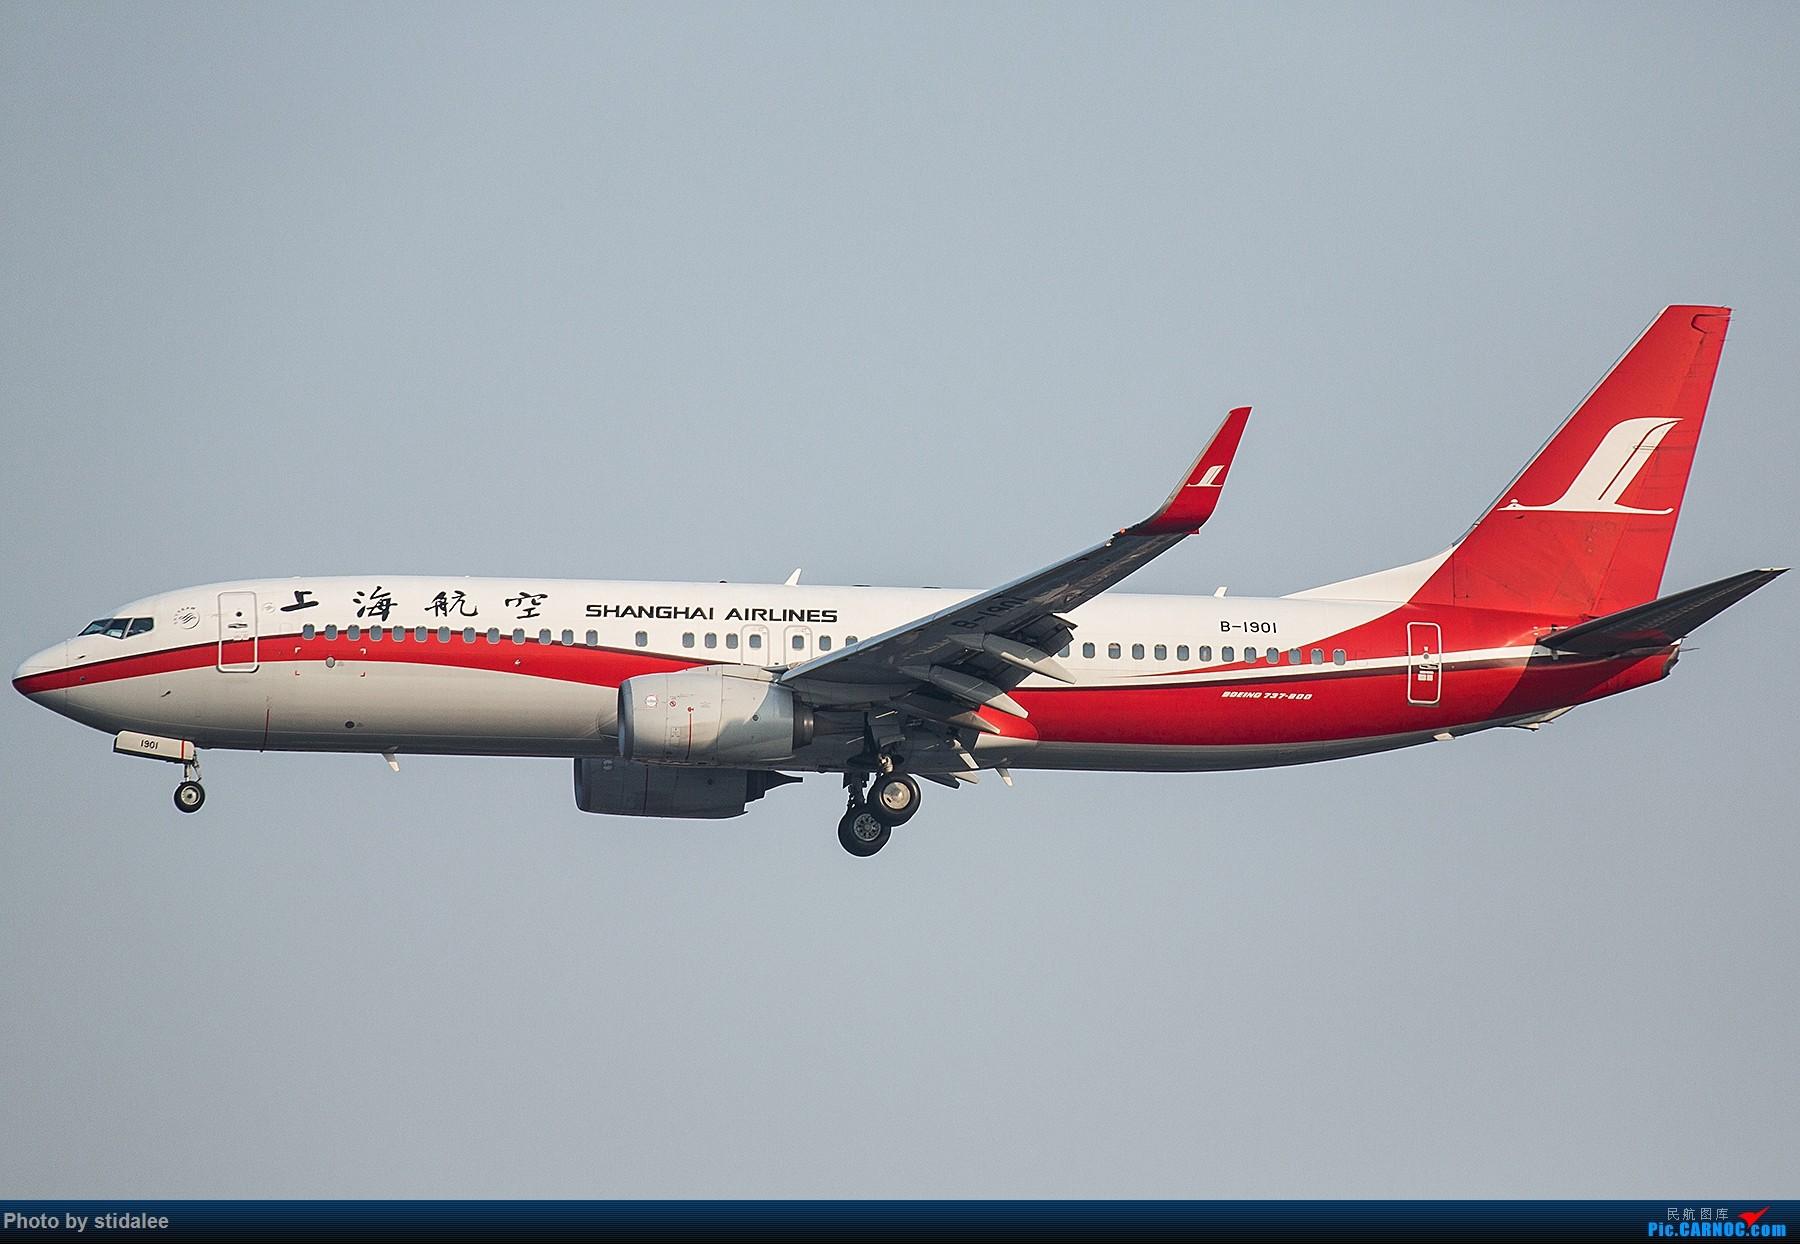 Re:[原创]SHA拍机 各种地主上航飞机 最喜欢的涂装 BOEING 737-800 B-1901 中国上海虹桥国际机场